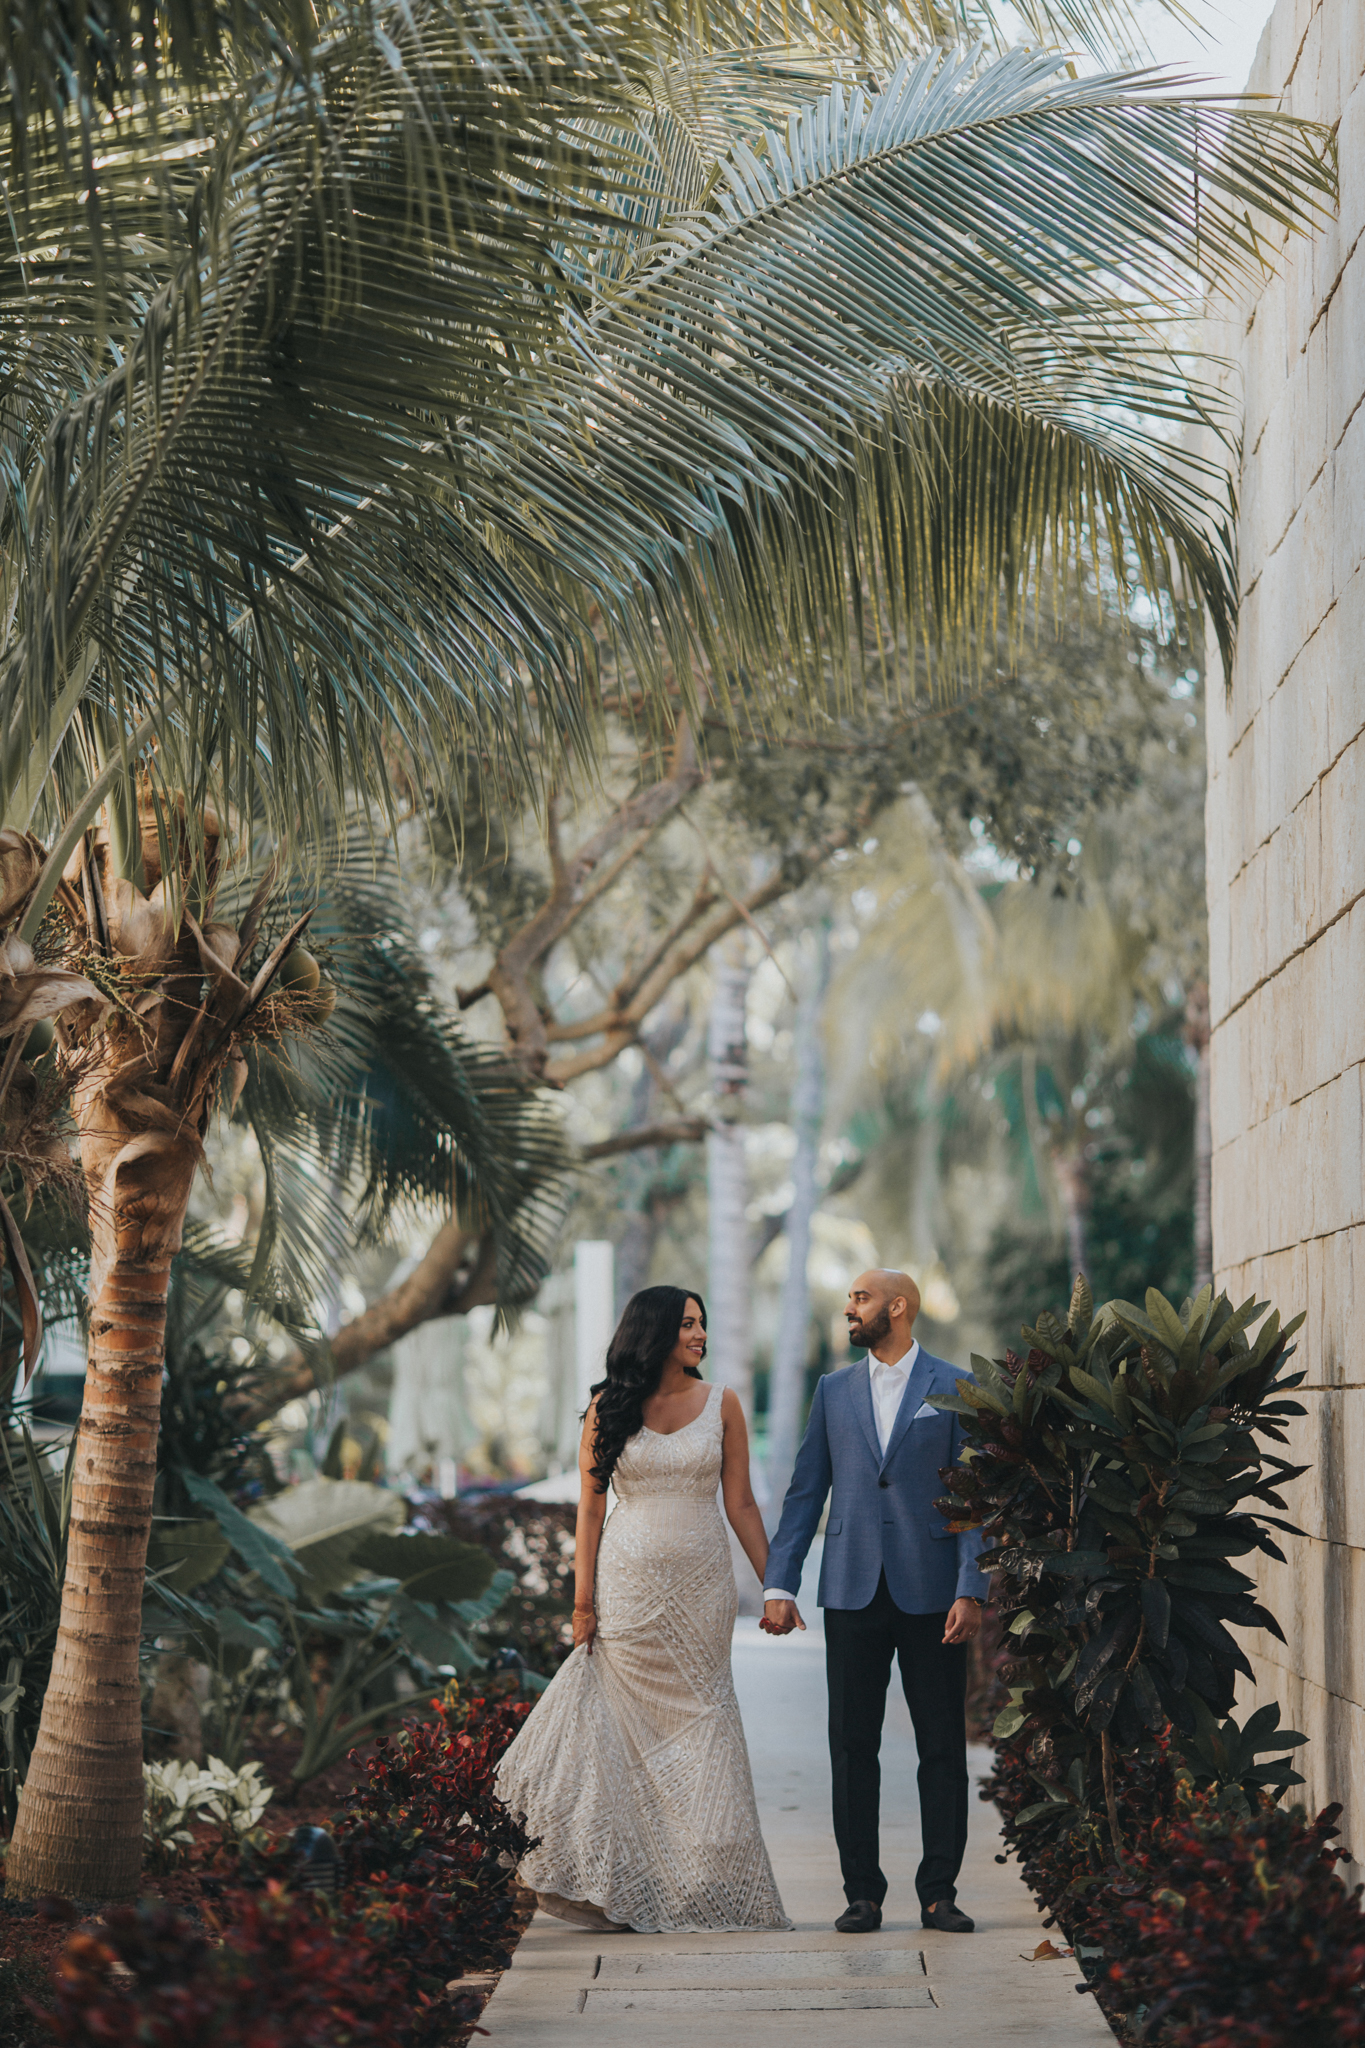 jessicajag_wedding_blush781.jpg